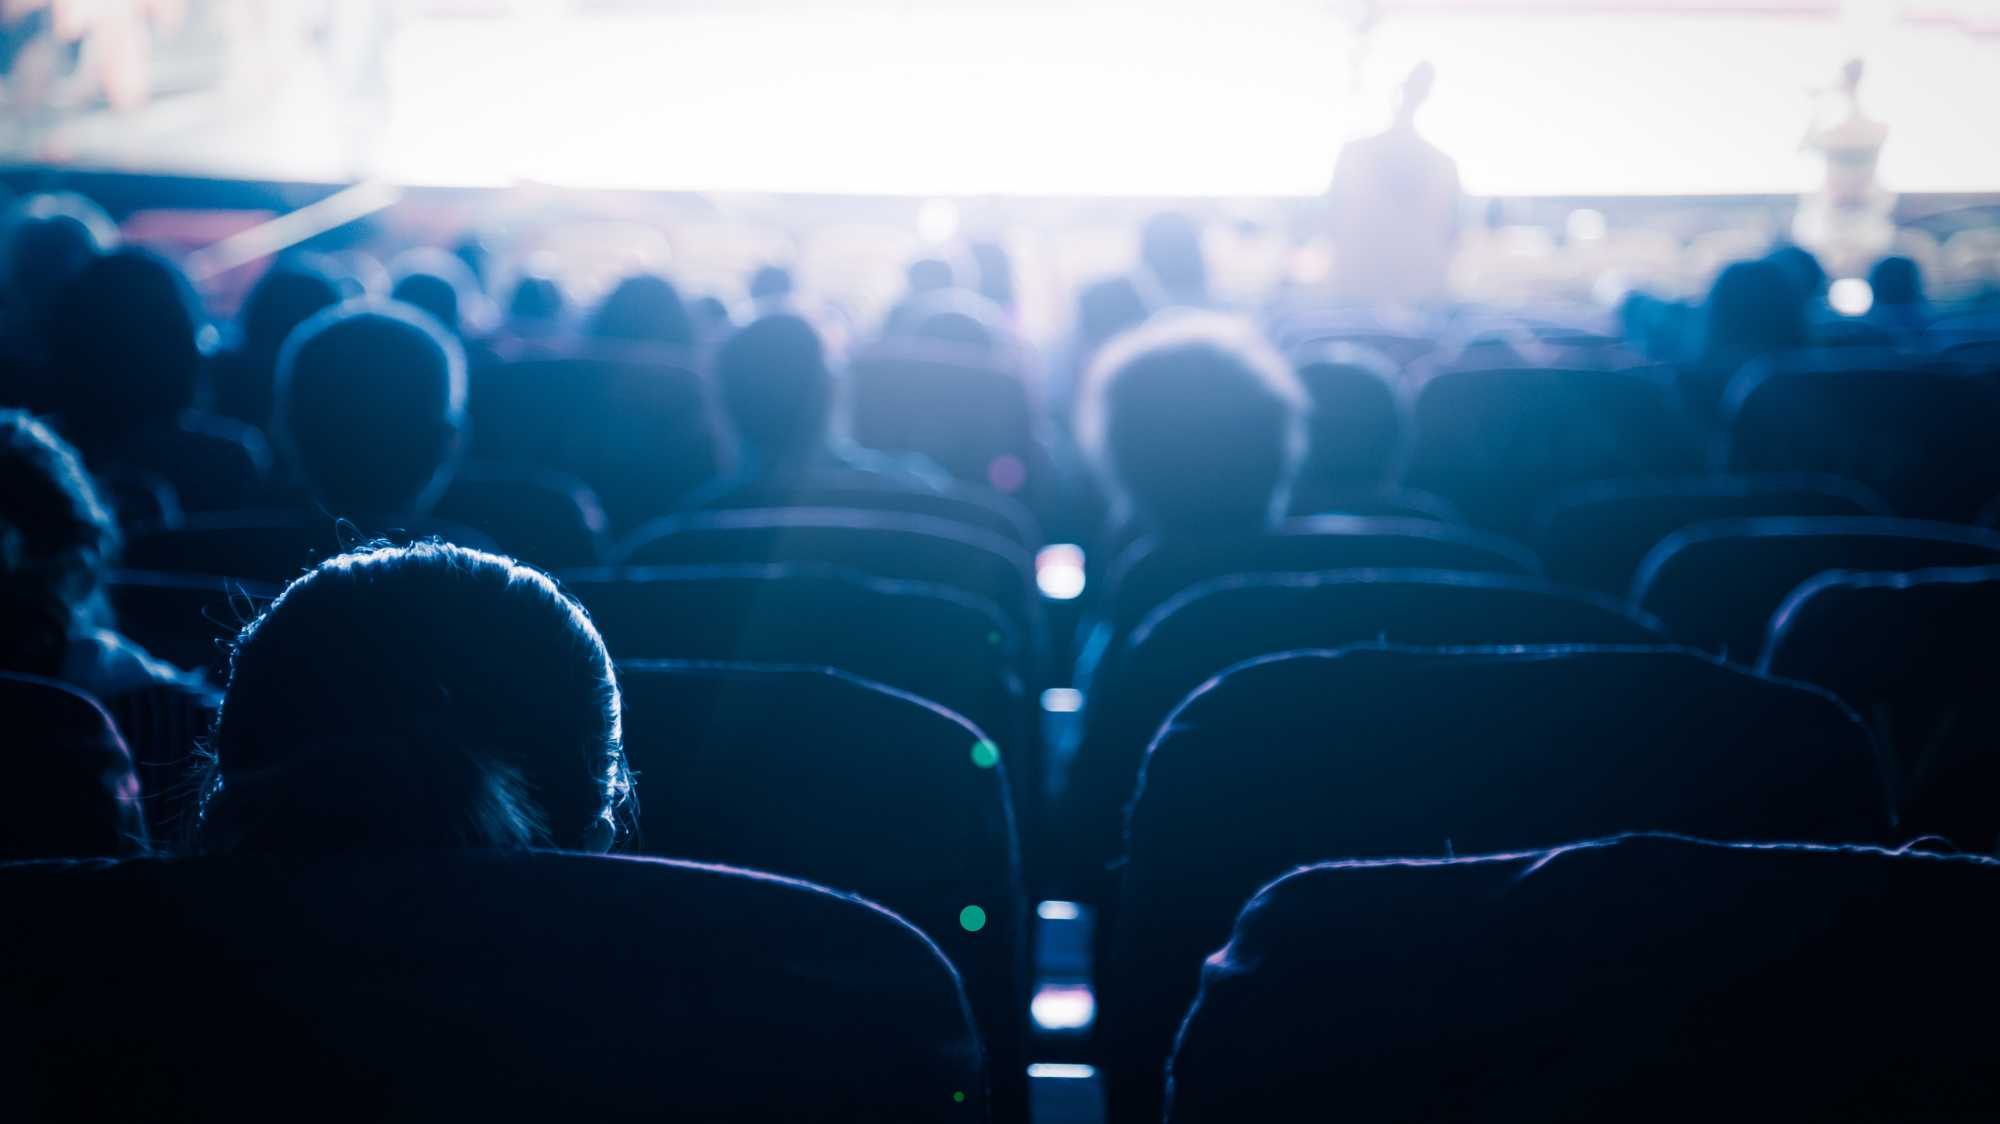 Neue Berlinale-Leitung: Ausschluss von Netflix wäre falscher Weg